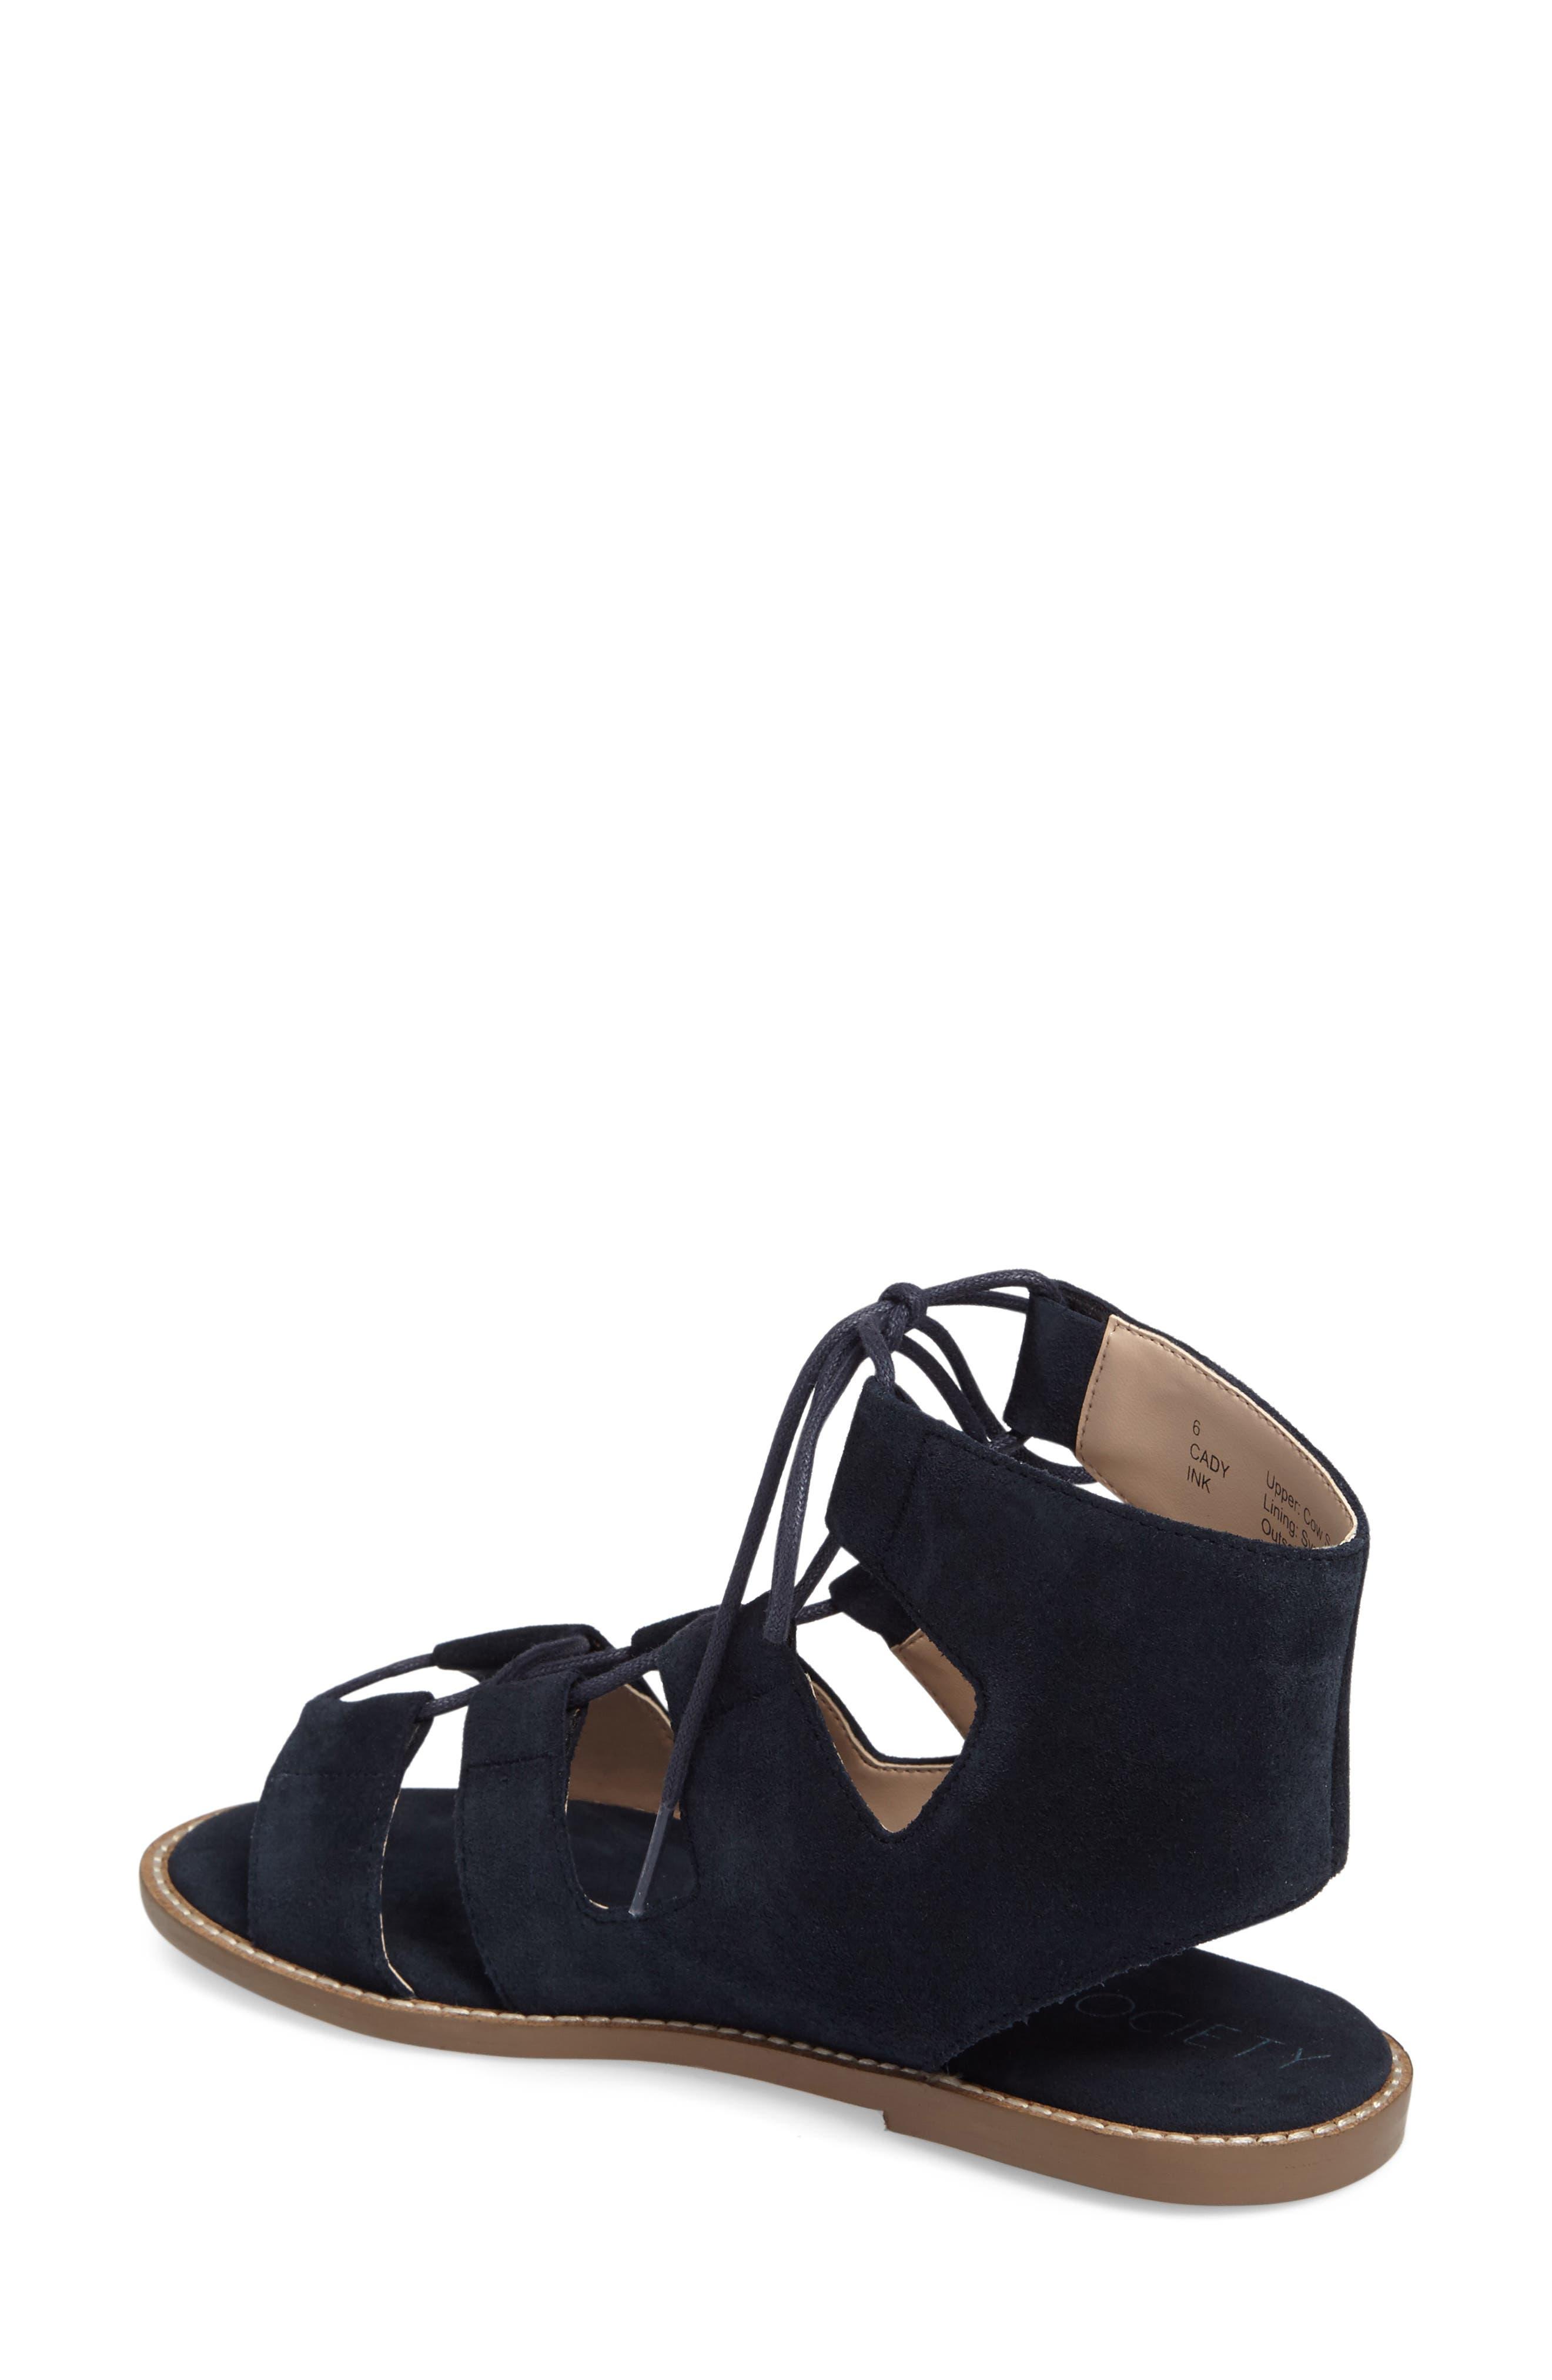 'Cady' Lace-Up Flat Sandal,                             Alternate thumbnail 8, color,